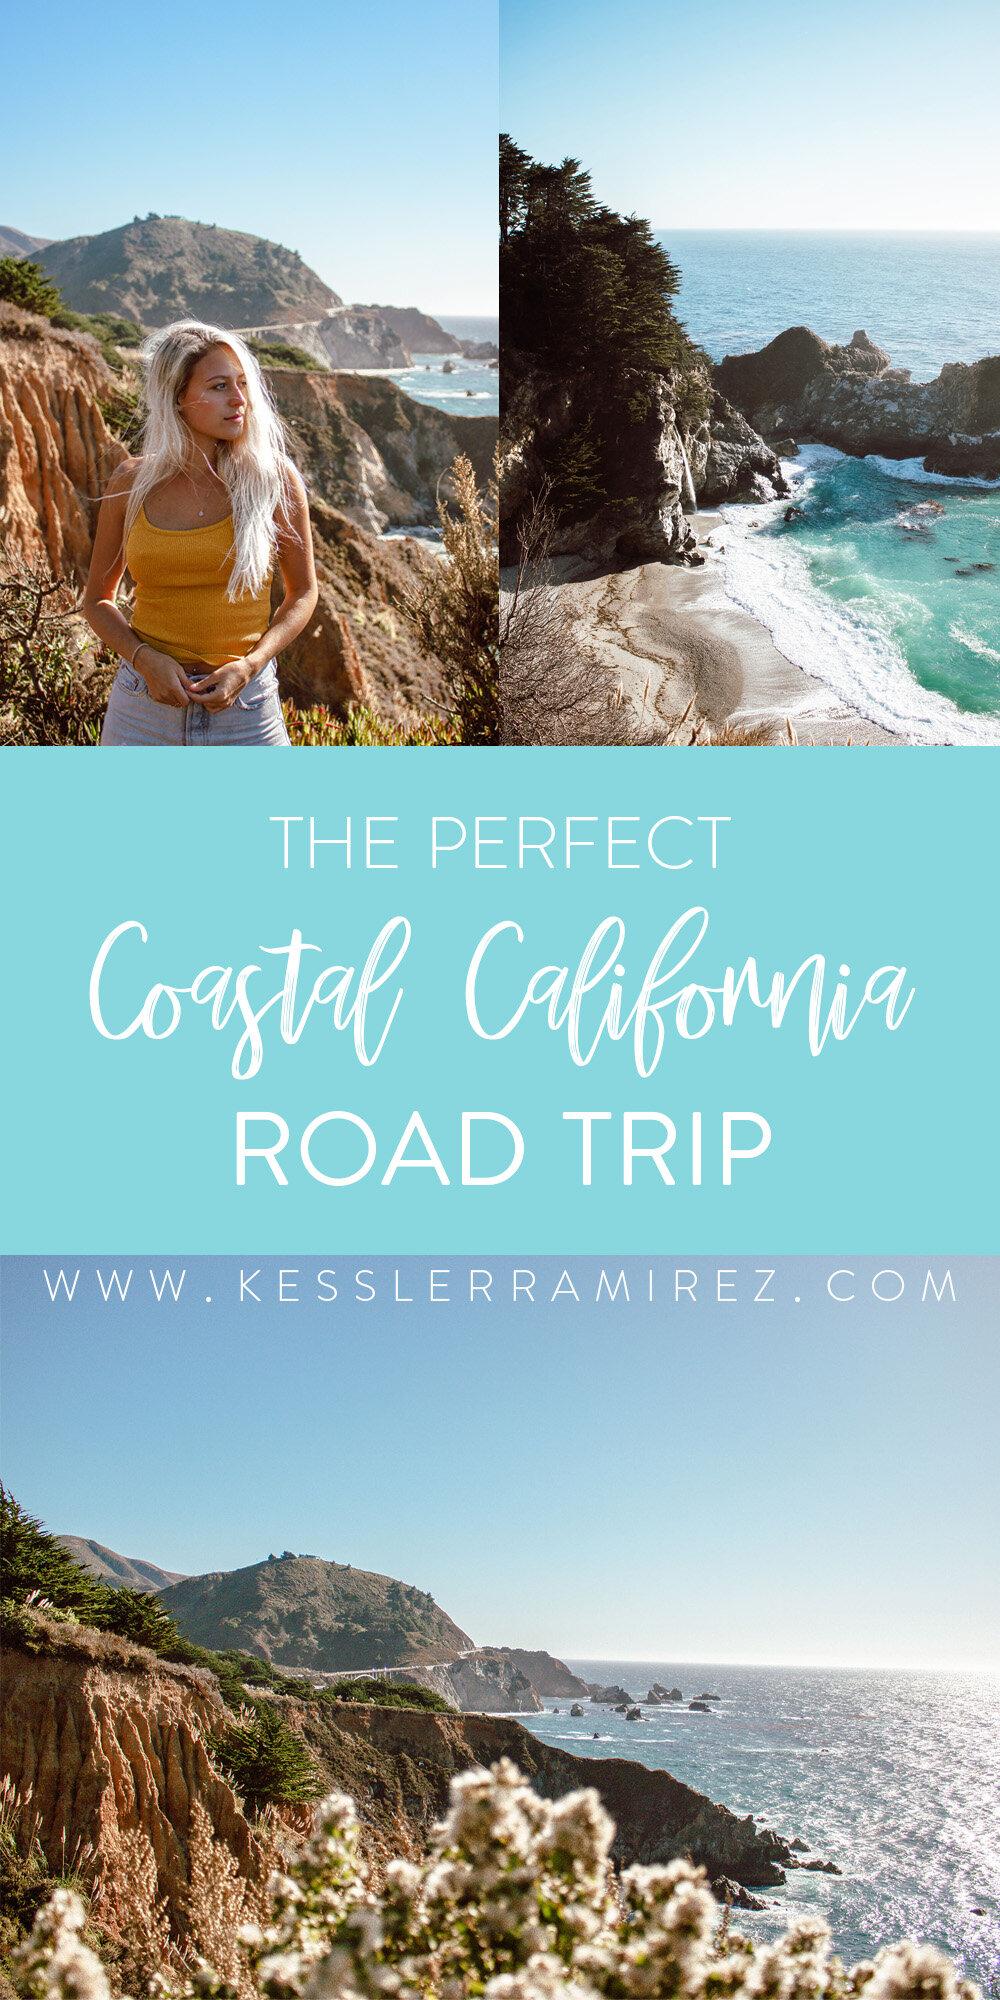 The Perfect Coastal California Road Trip